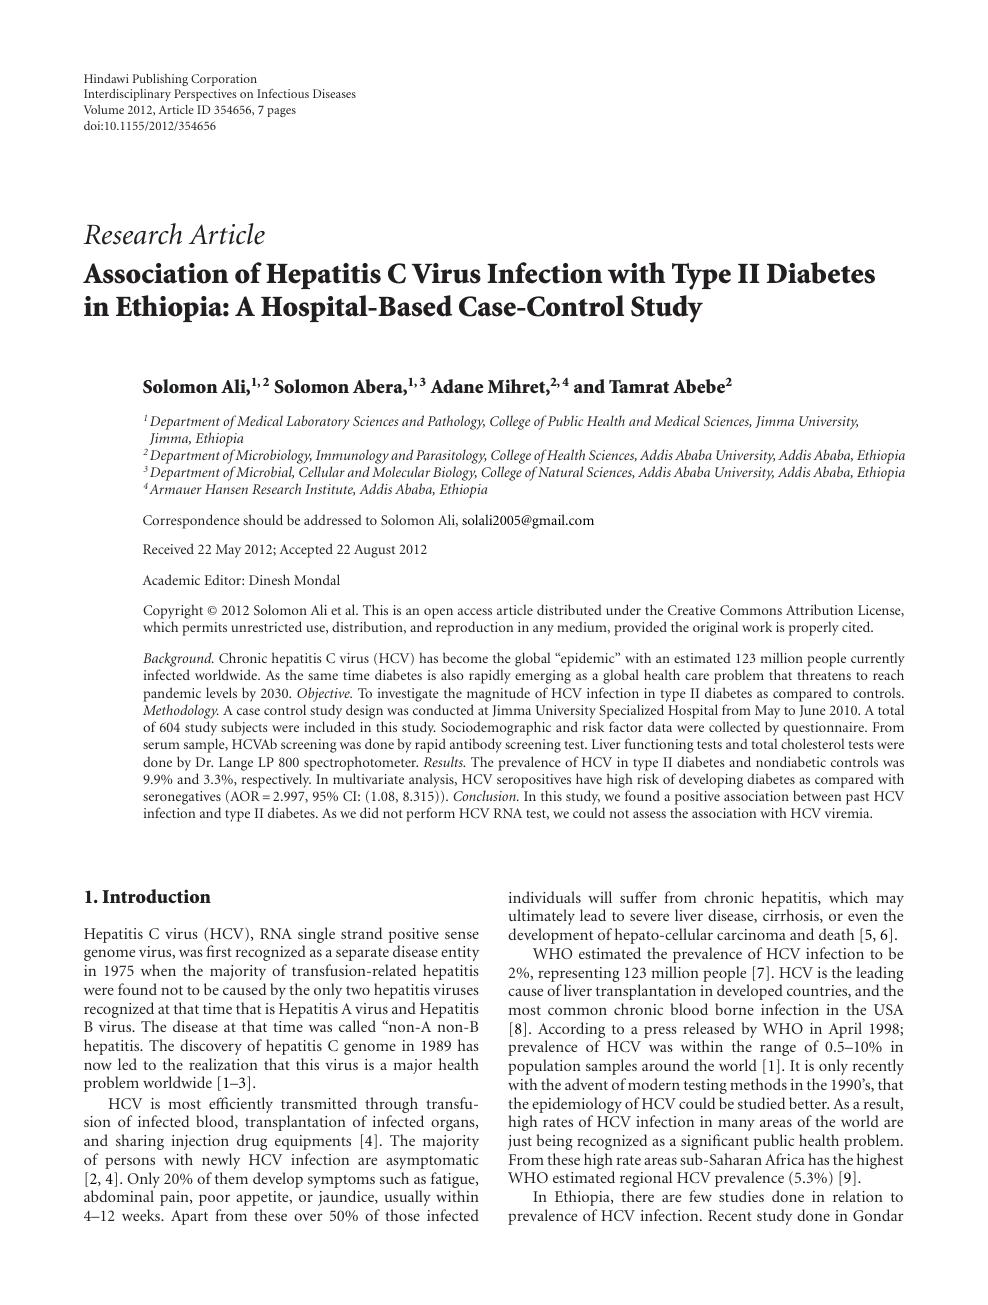 Association of Hepatitis C Virus Infection with Type II